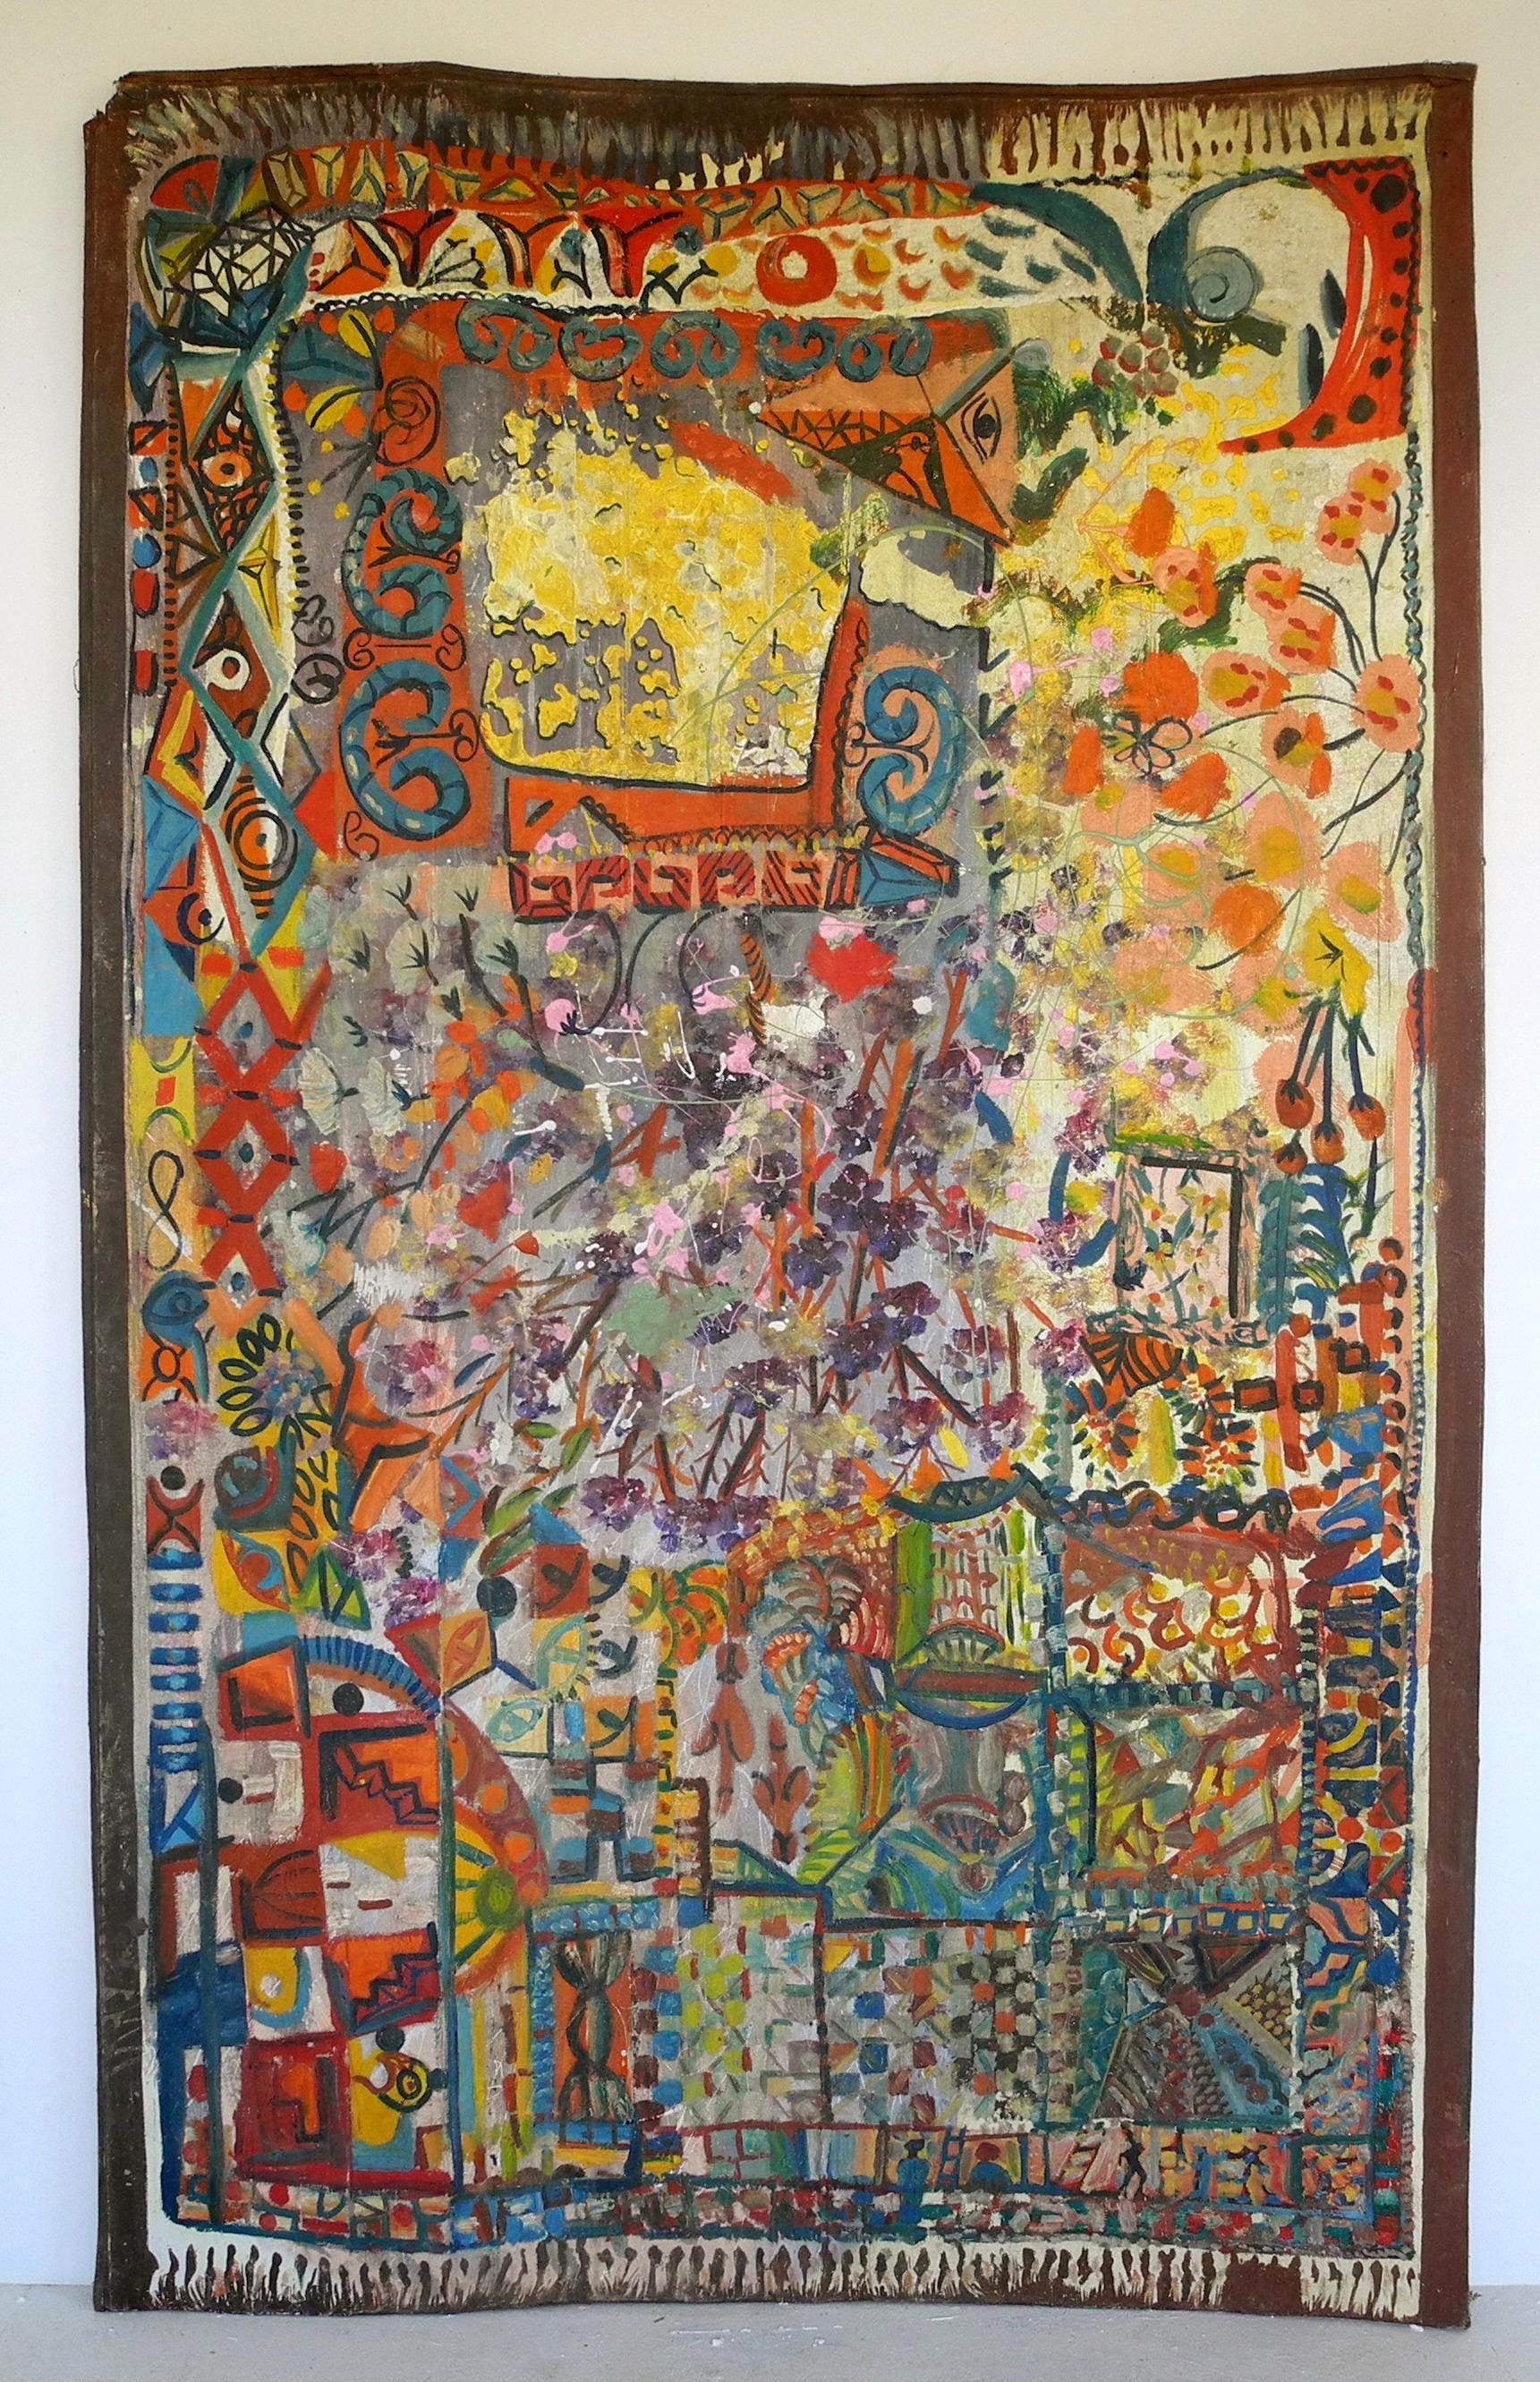 Crazy Painting Painting Paula J Wilson